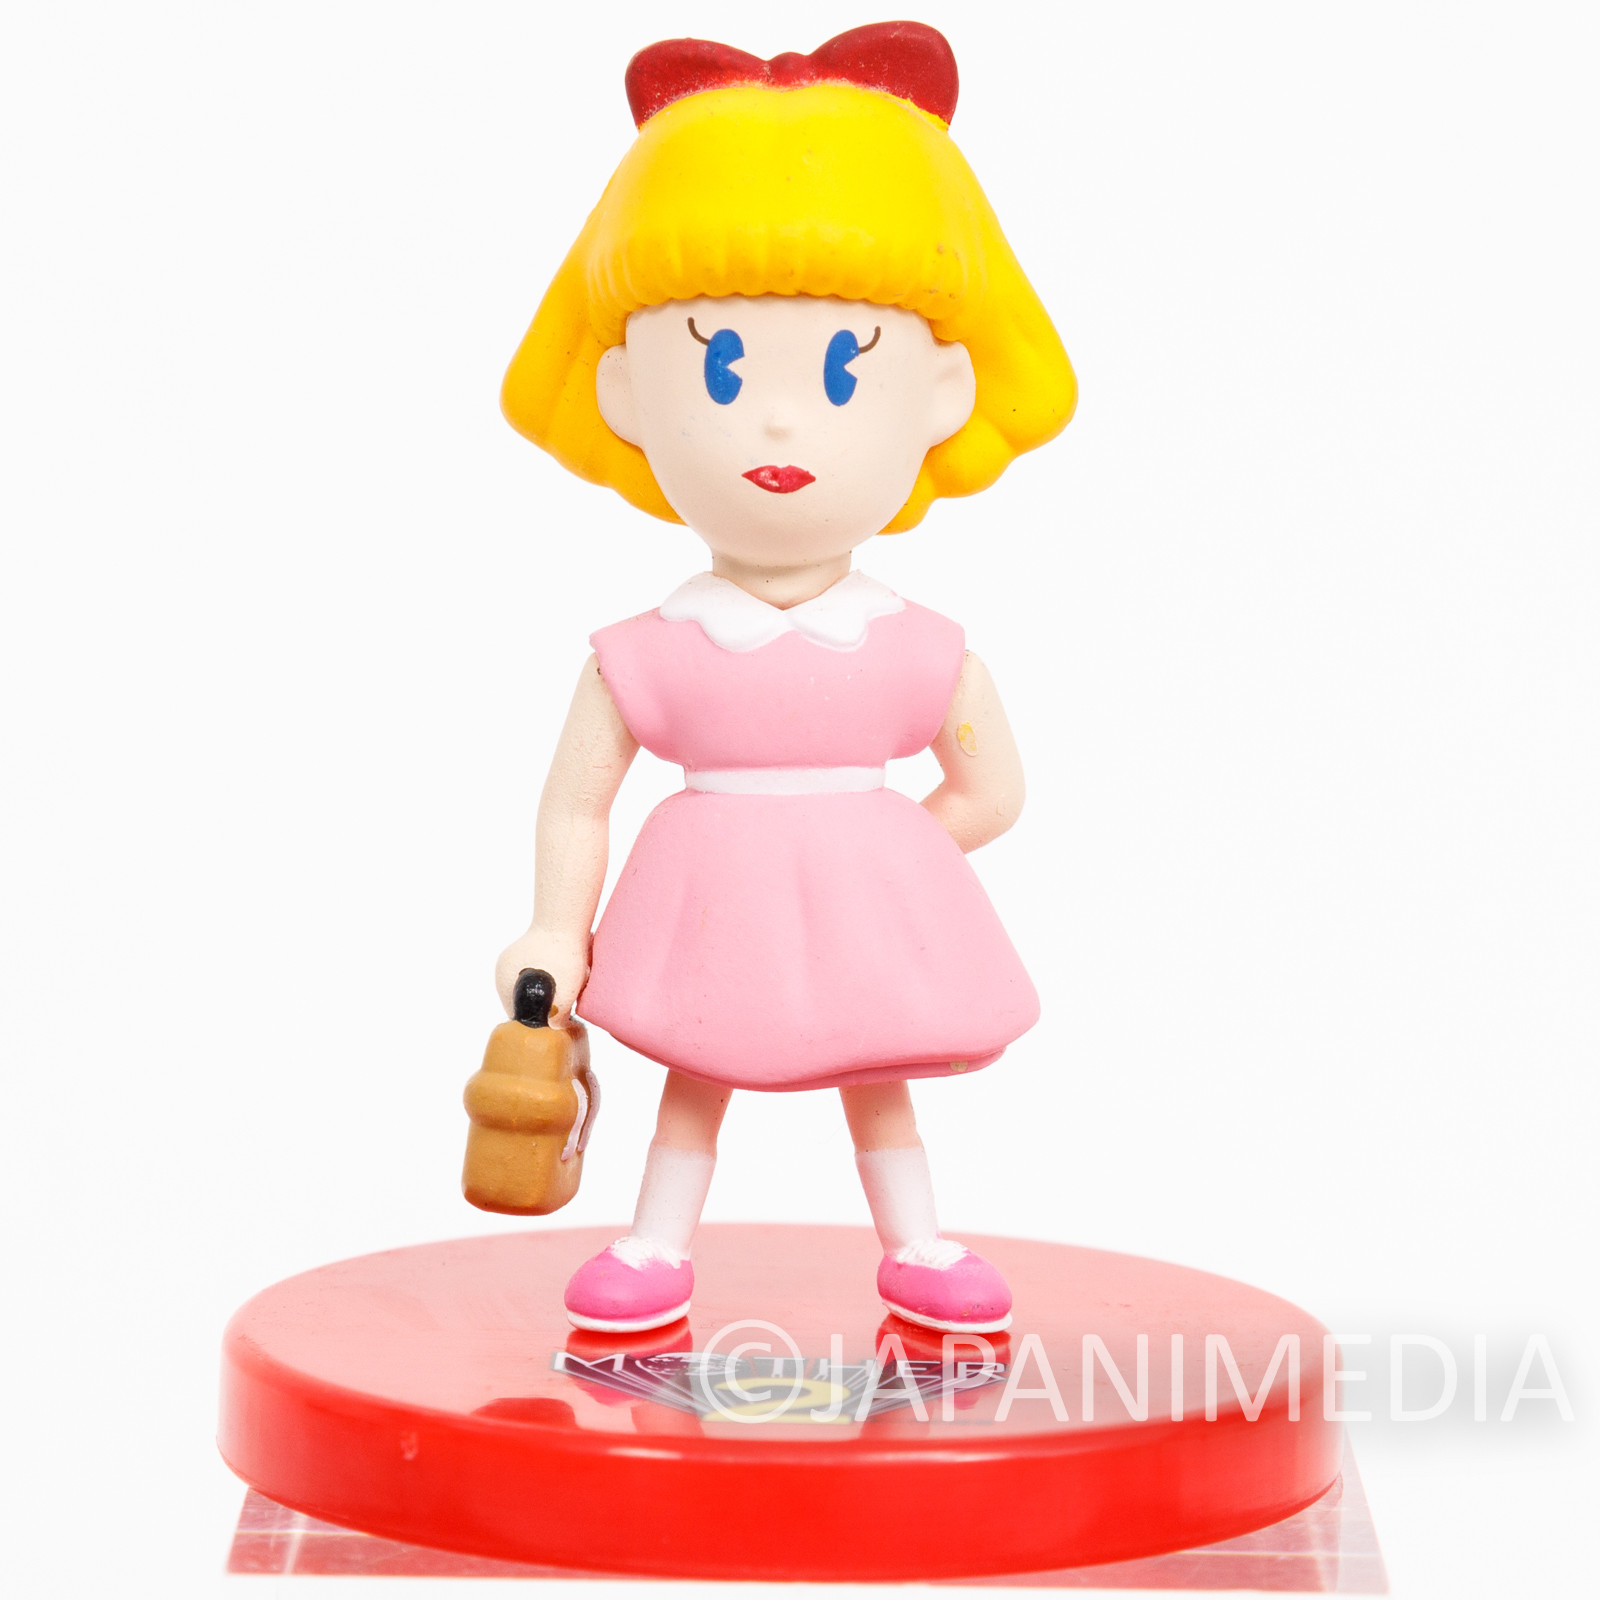 Mother 2 Paula Stand Figure Takara Tomy Nintendo JAPAN GAME NES FAMICOM